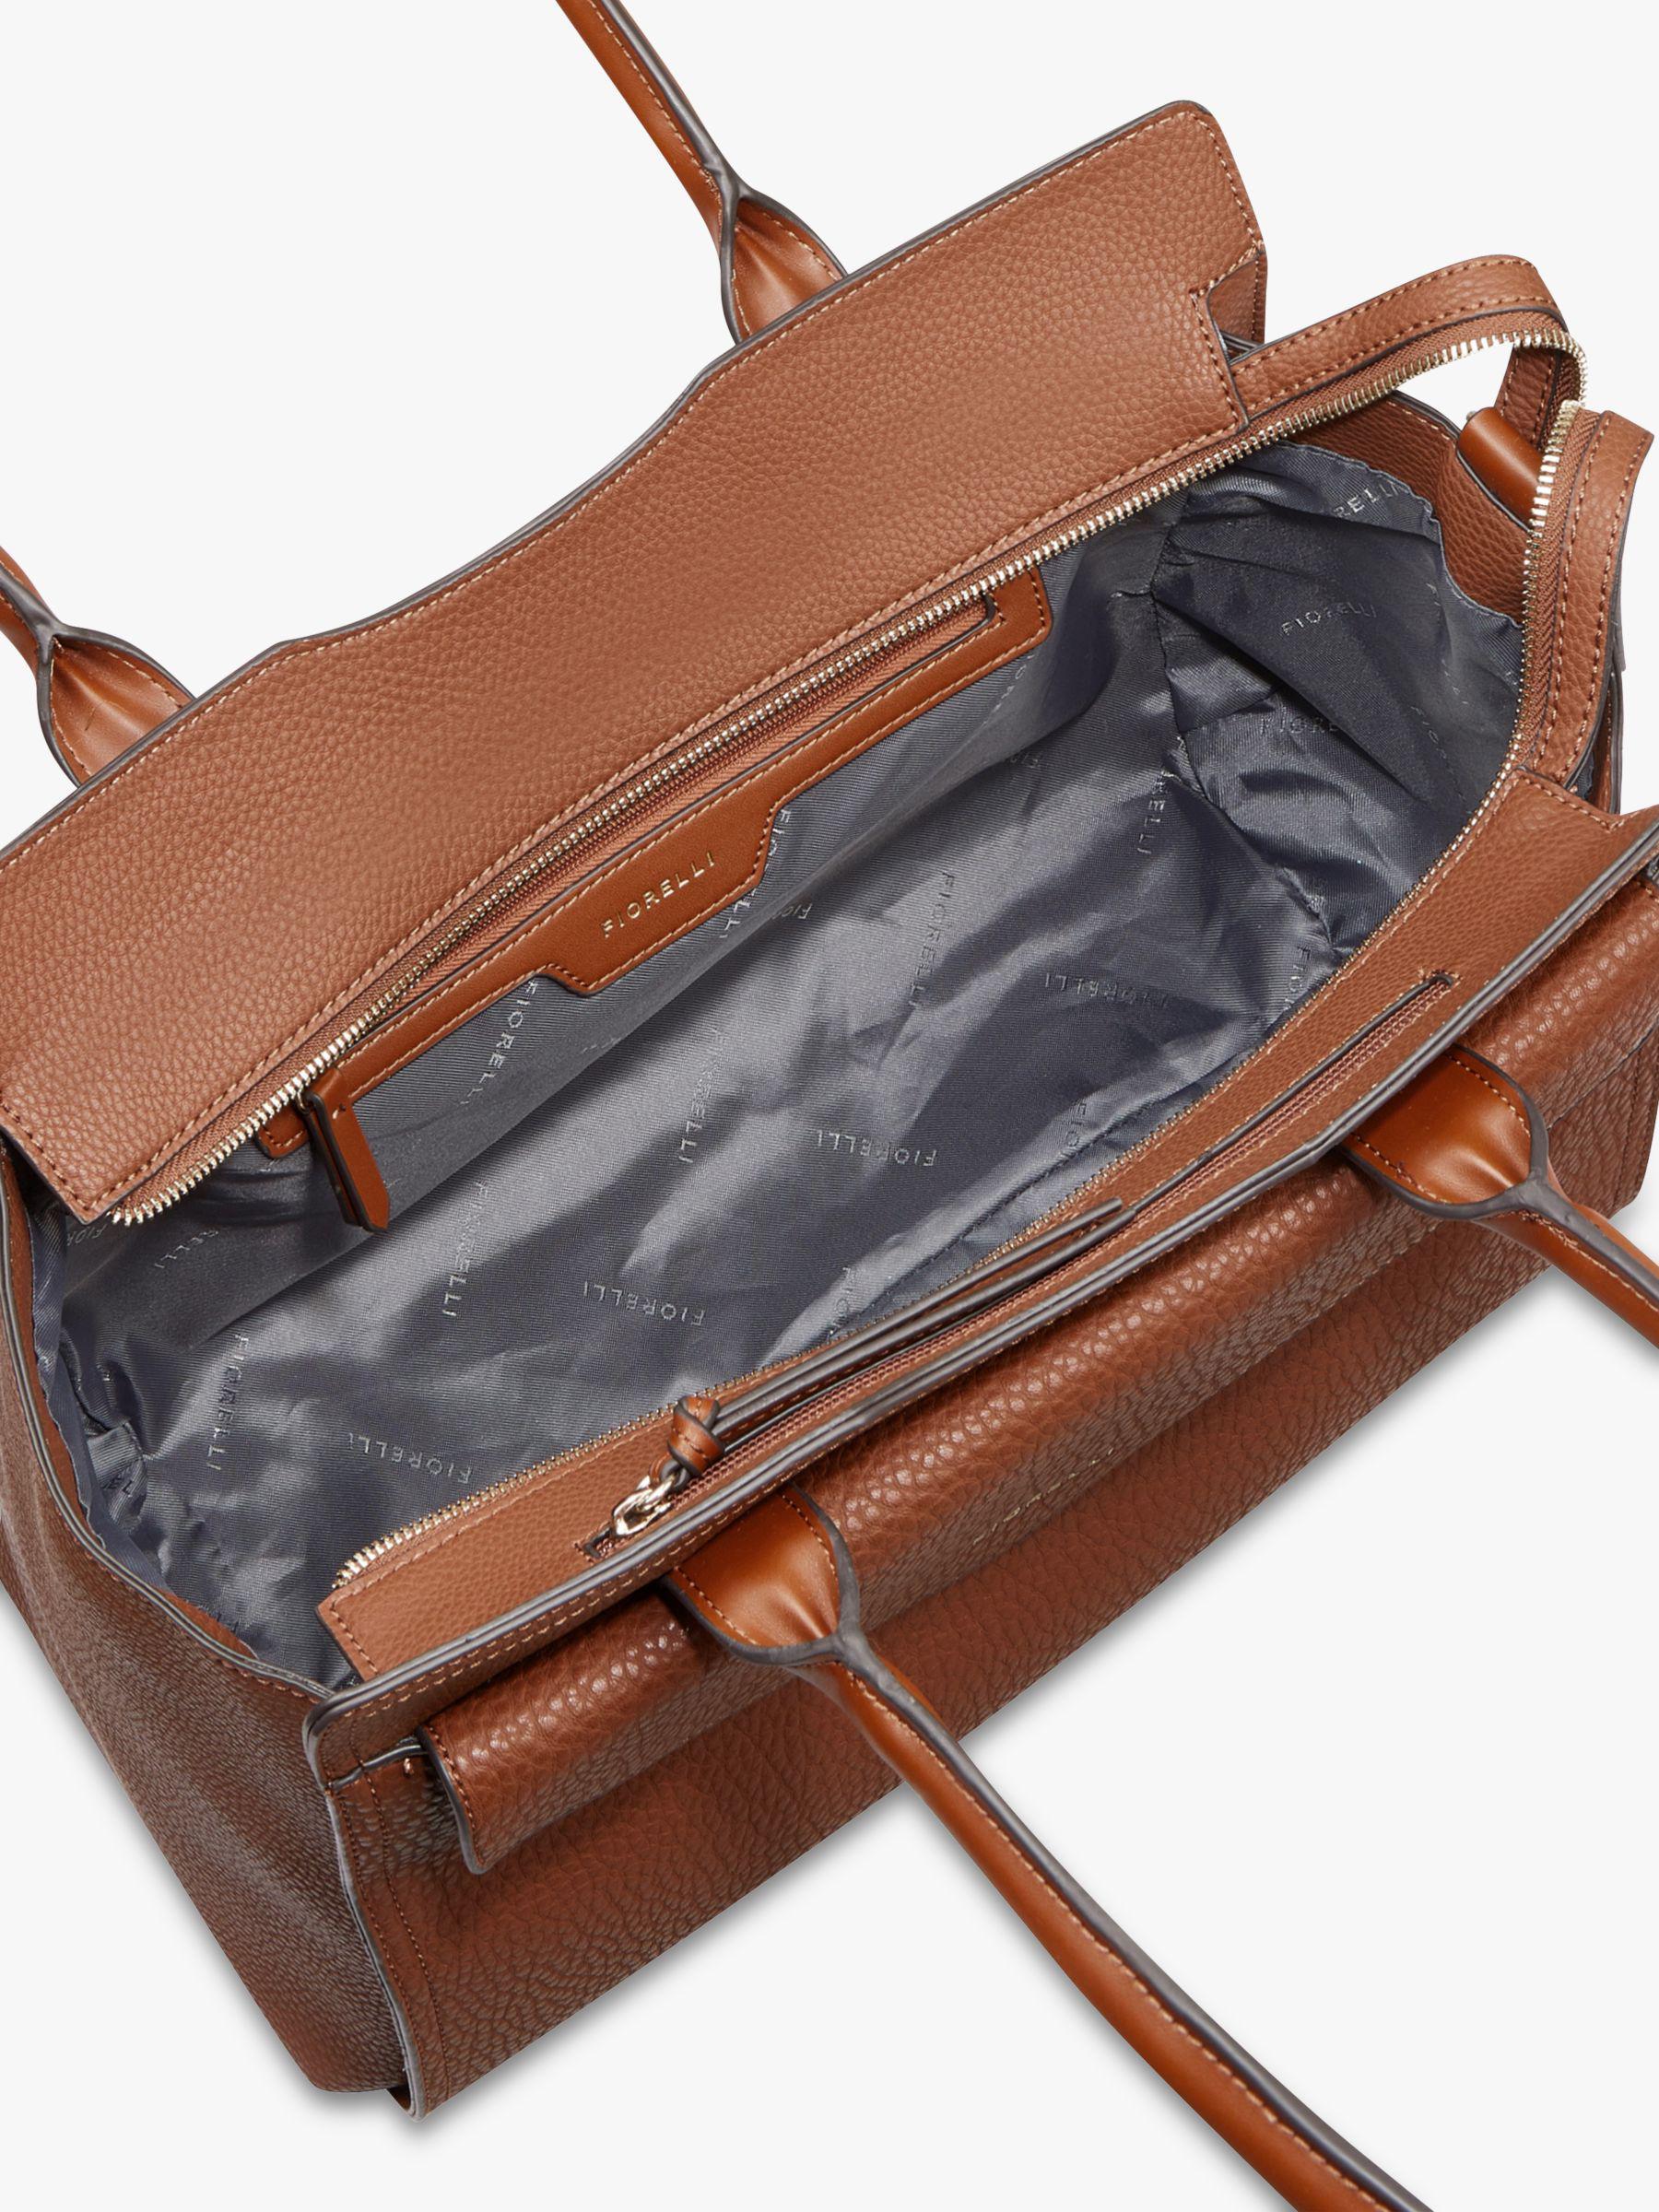 dd2a733343b6 Fiorelli Mila Tote Bag in Brown - Lyst